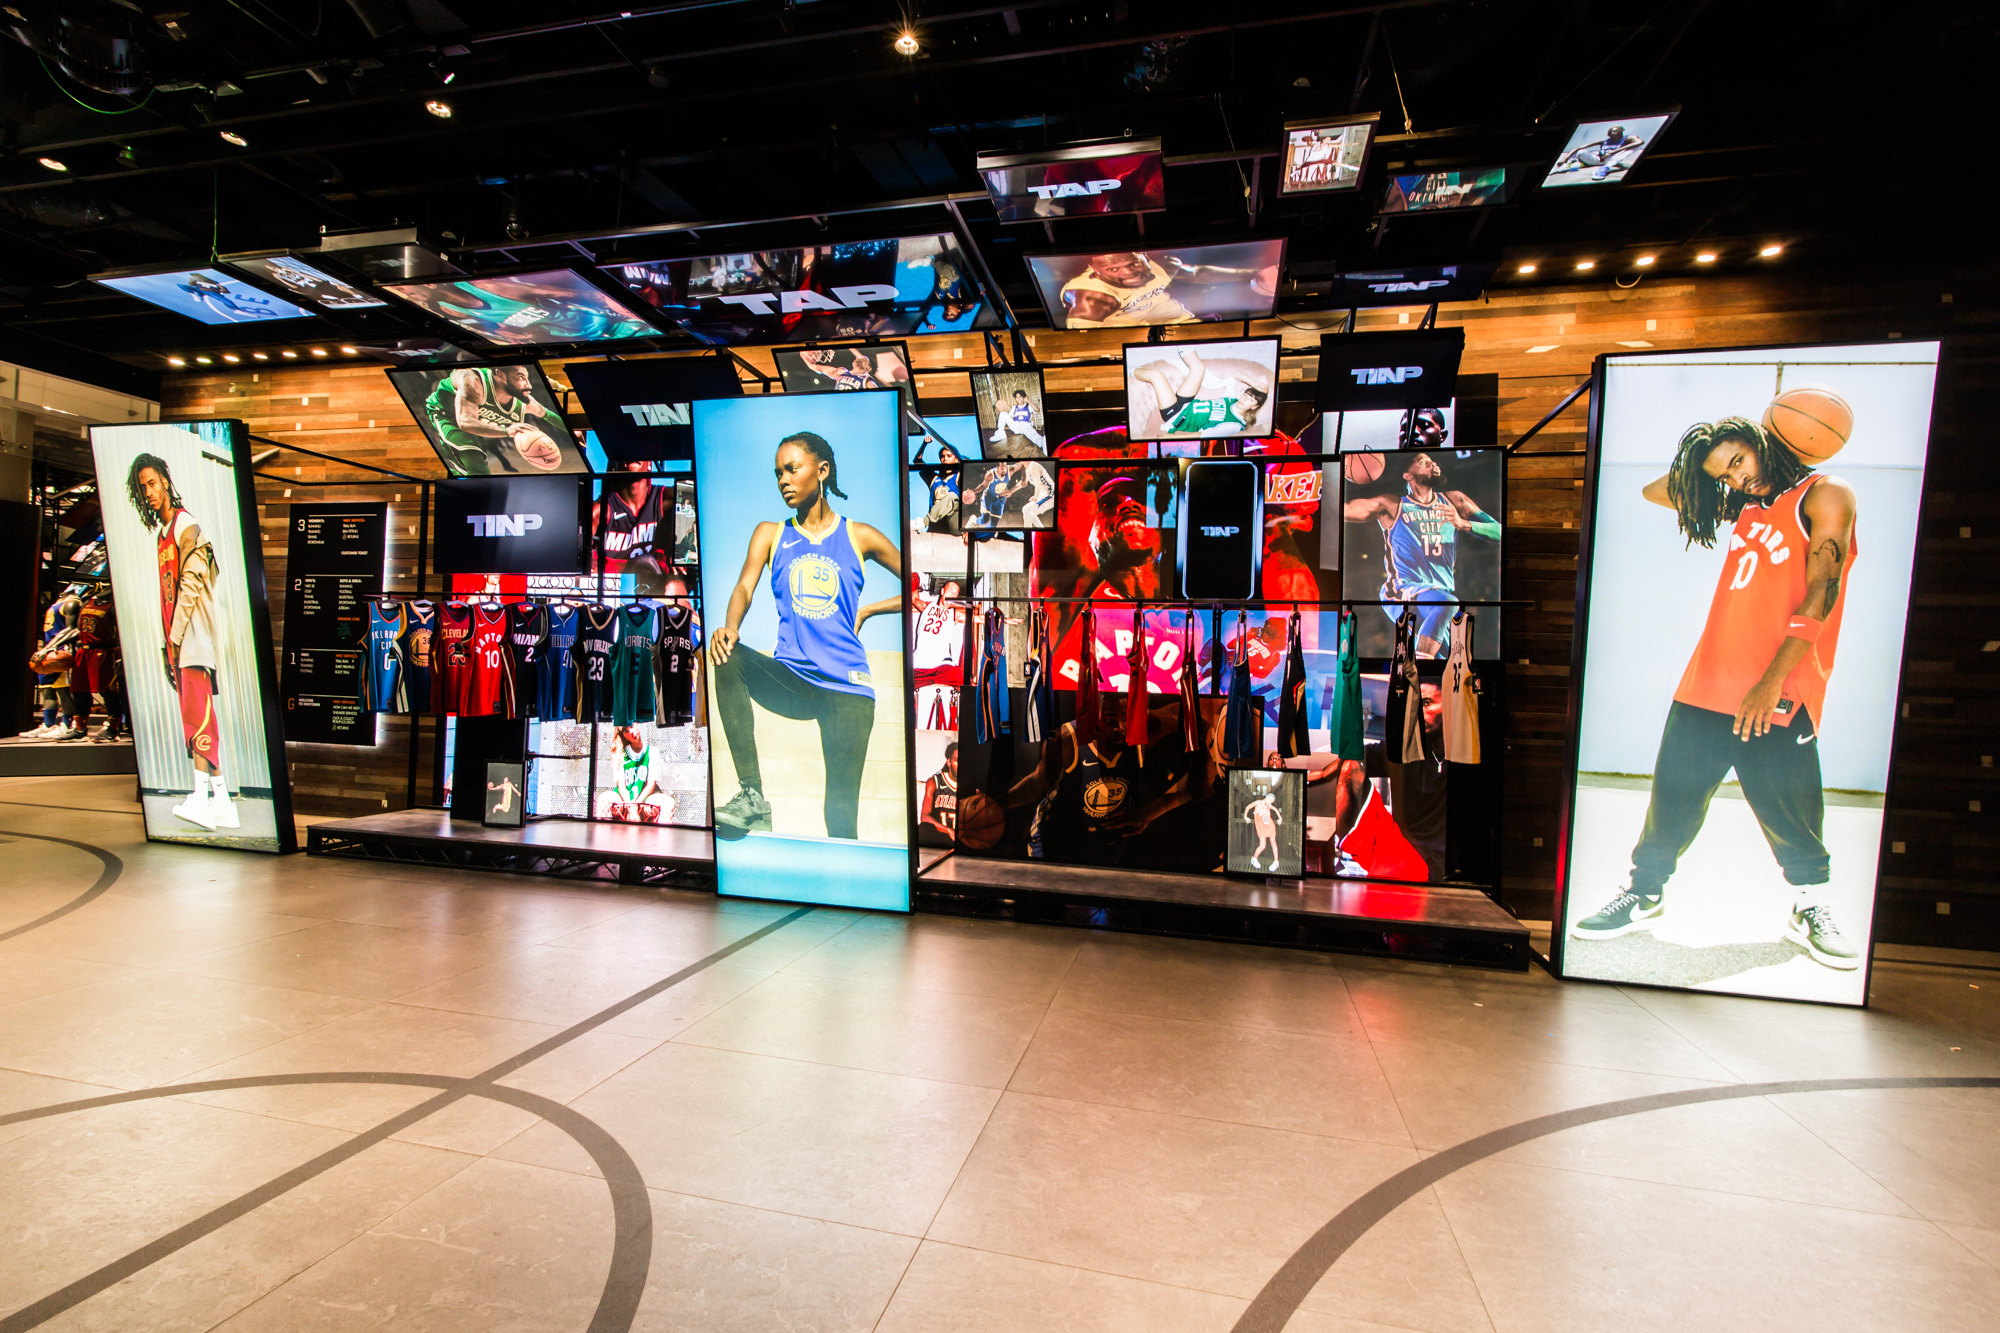 TDM_3131 - Nike - NBA Launch - NTL - Tom D Morgan - WEB.jpg